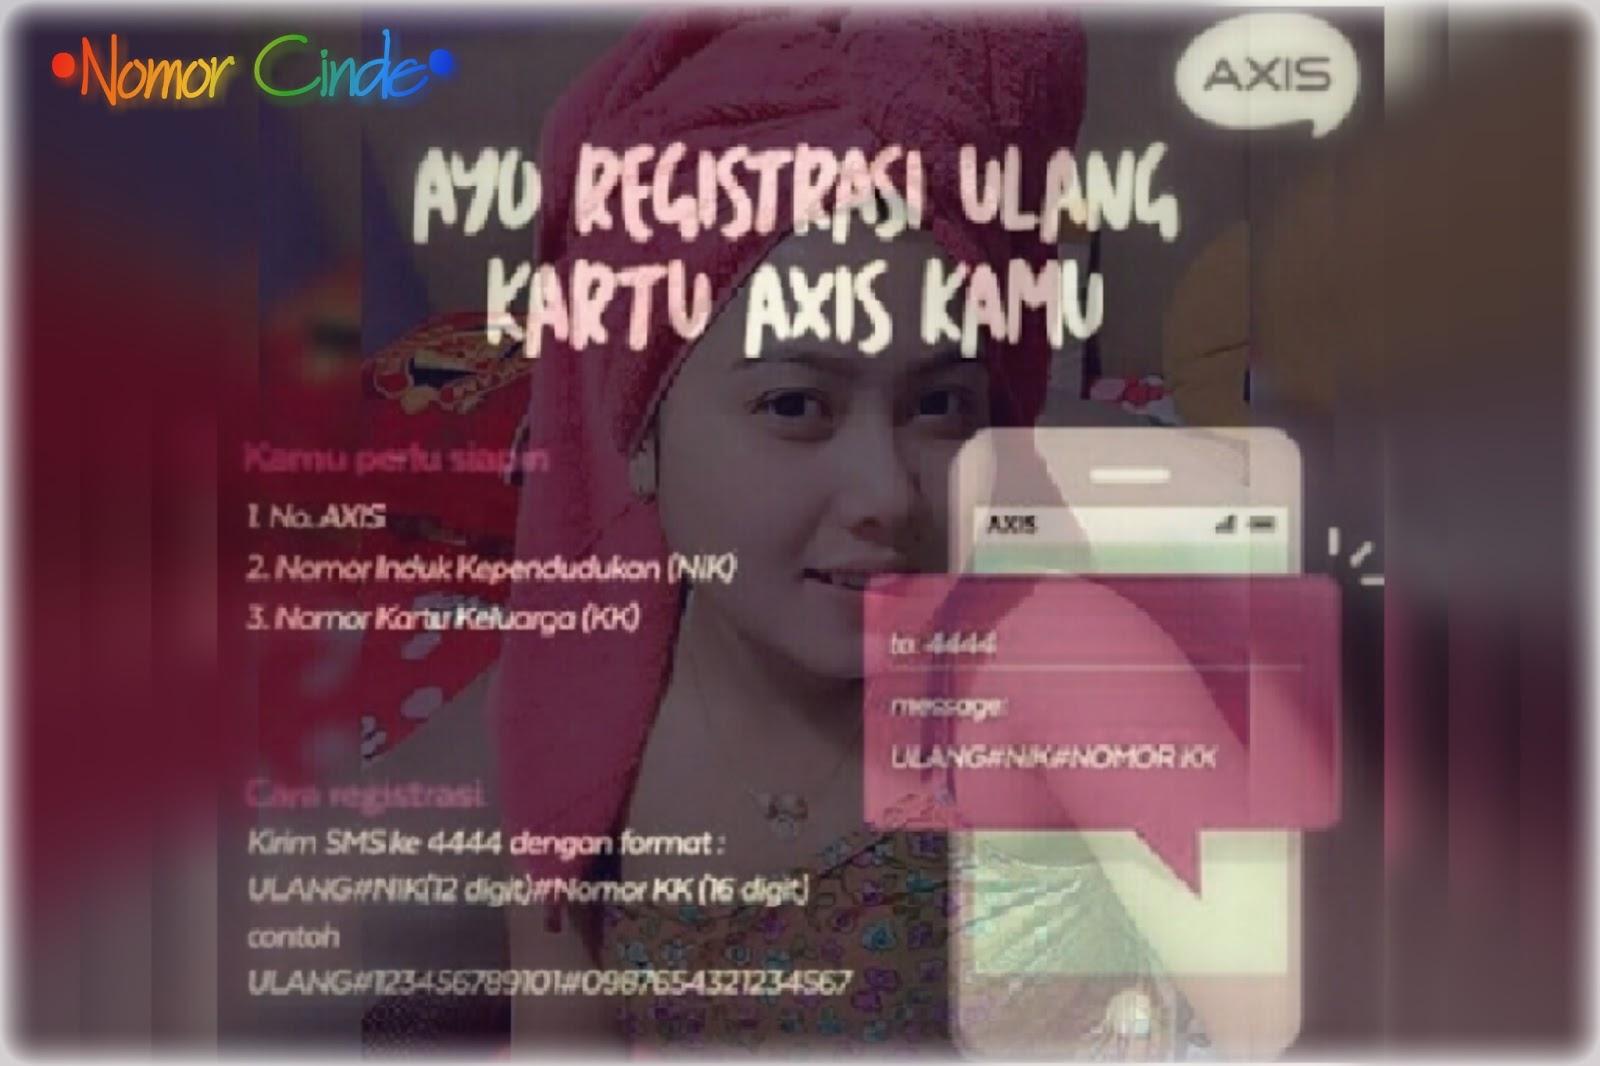 Registrasi Ulang Kartu Axis Beneran Dapat Bonus Kuota Internet 1gb Data Yellow 7 Hari 1 Gb Hitz